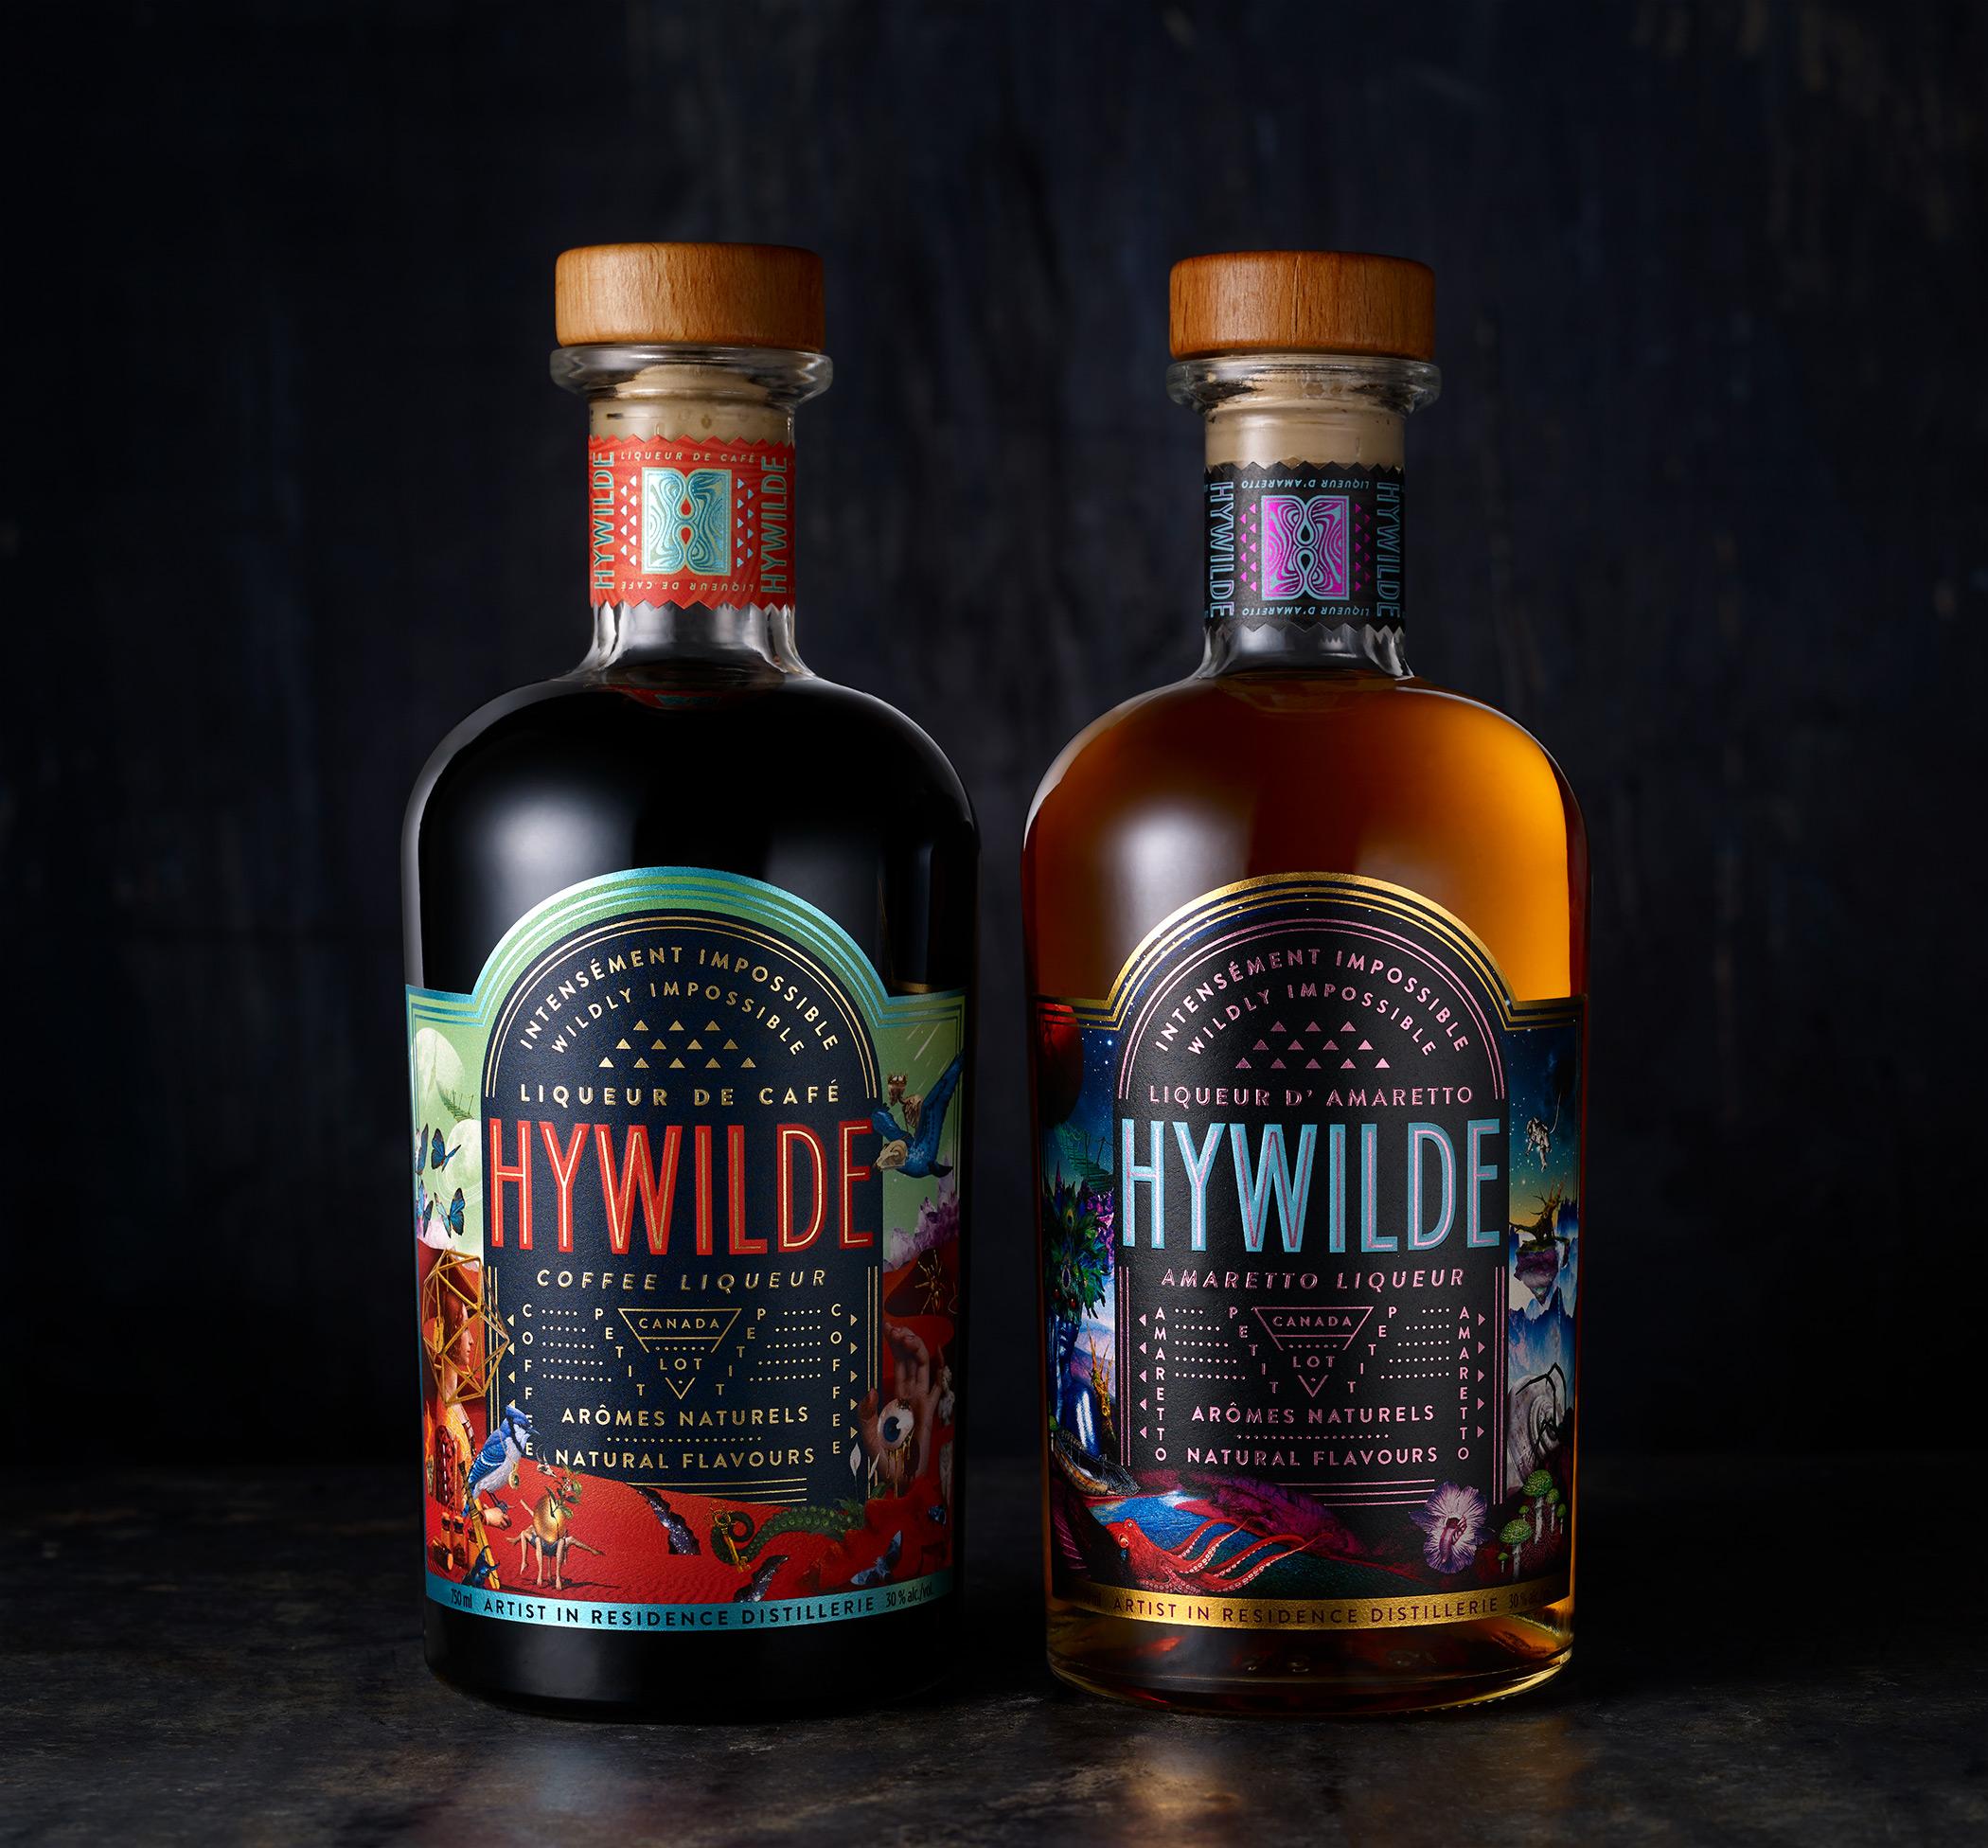 Hywilde duo - Chad Michael Studio